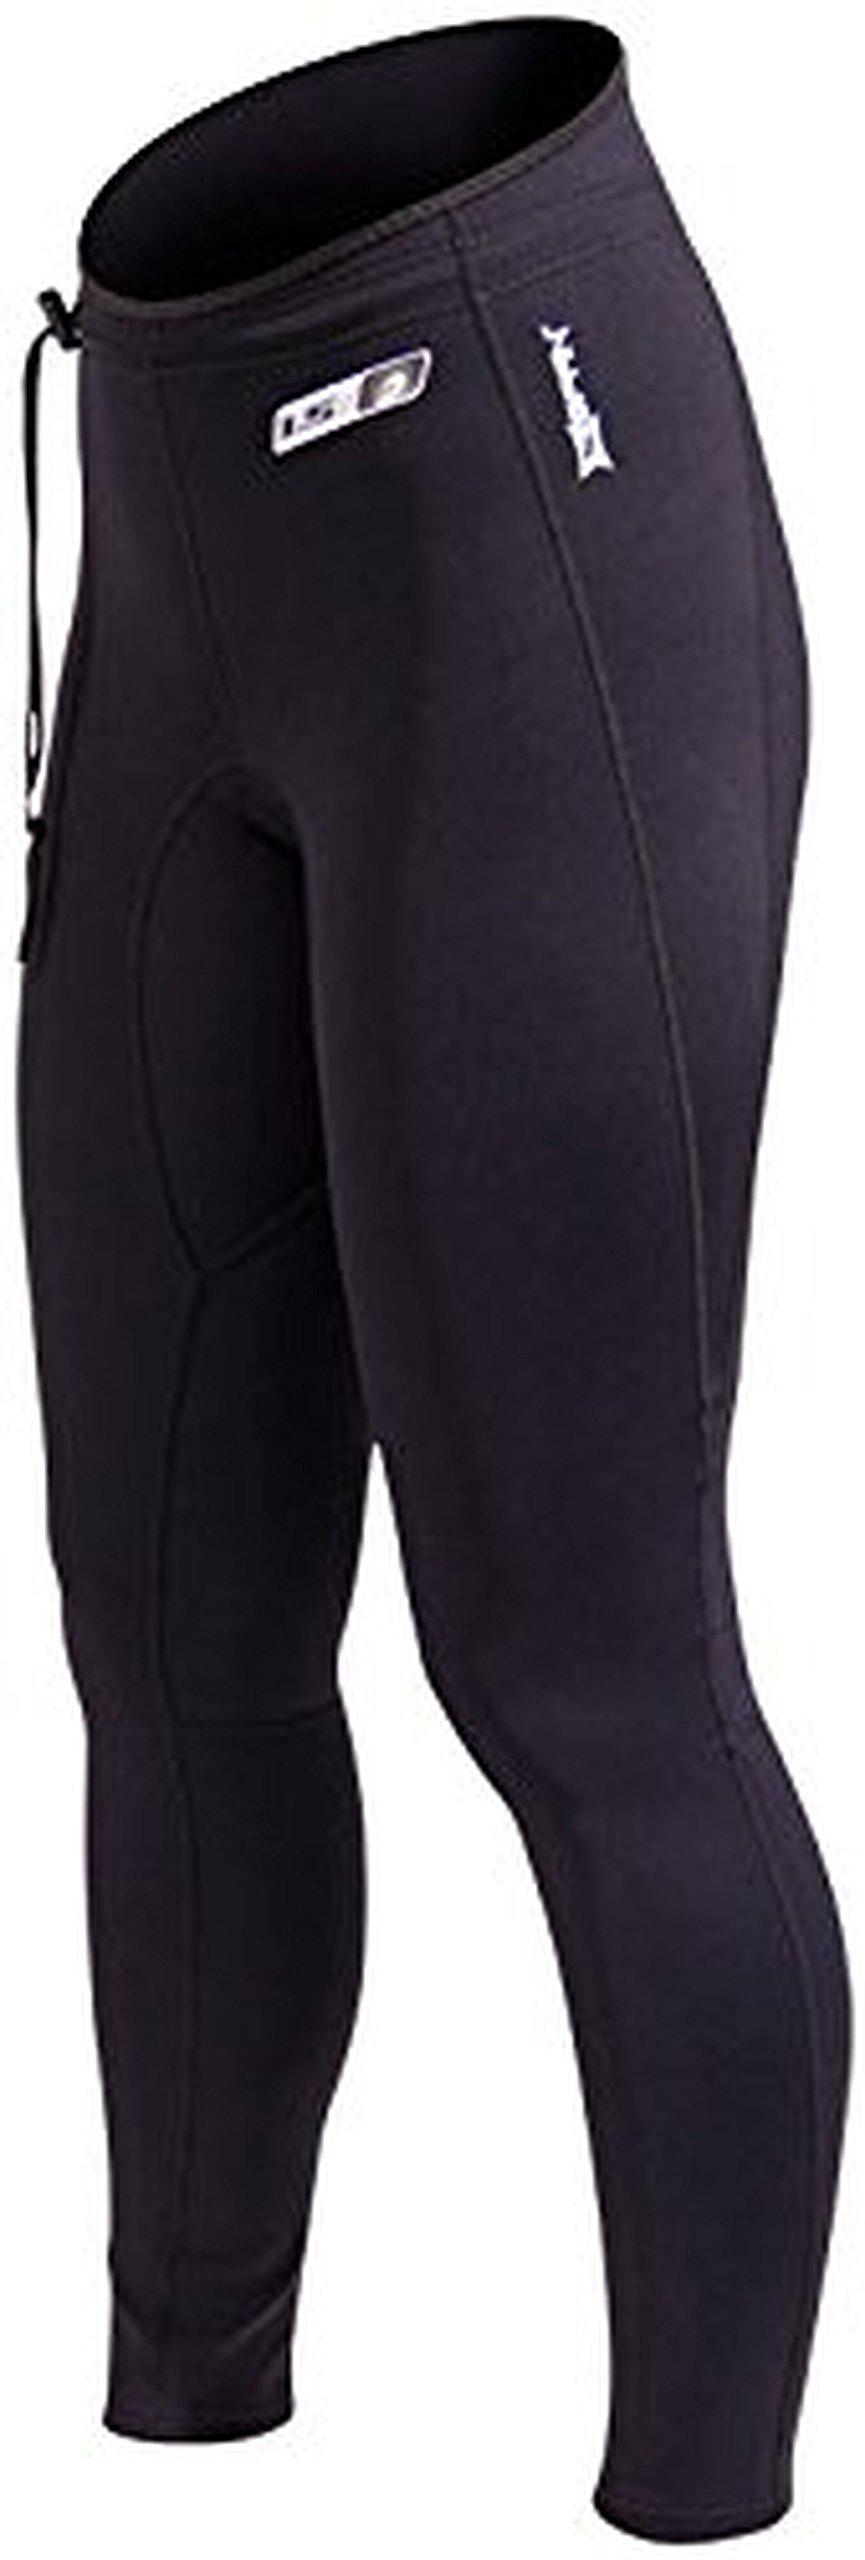 Neosport Unisex XSPAN 1.5mm Pants Black 3XL and Travel Sunscreen (15 SPF) Spray Bundle